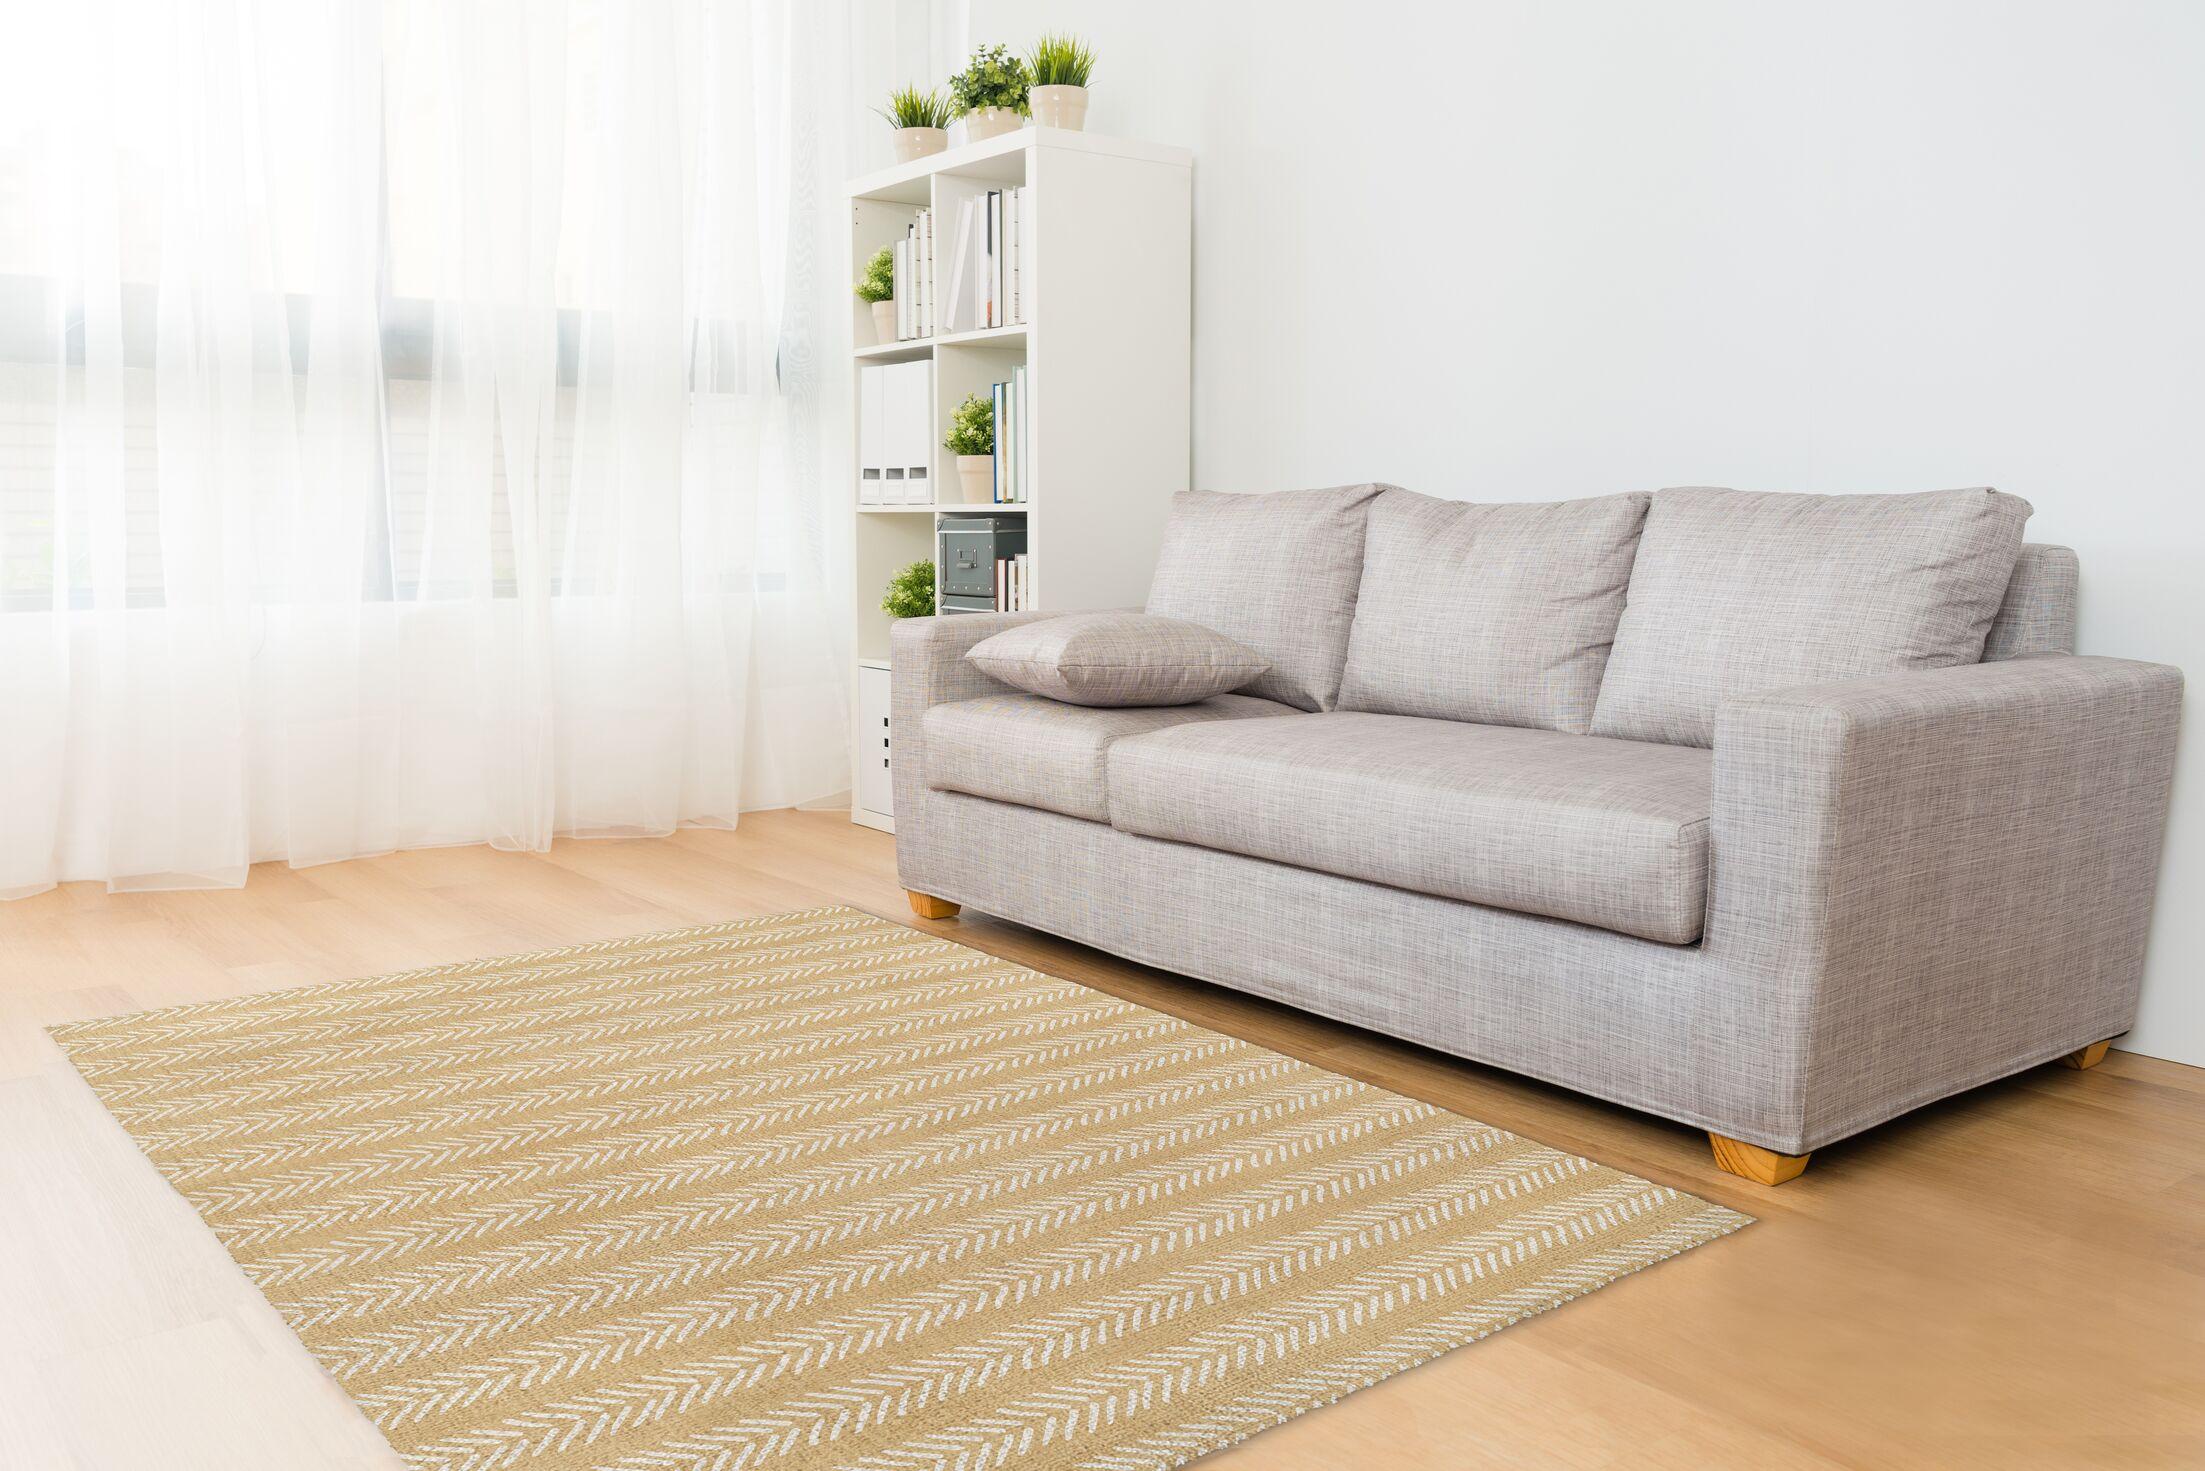 Cream Area Rug Rug Size: Rectangle 3' x 5'